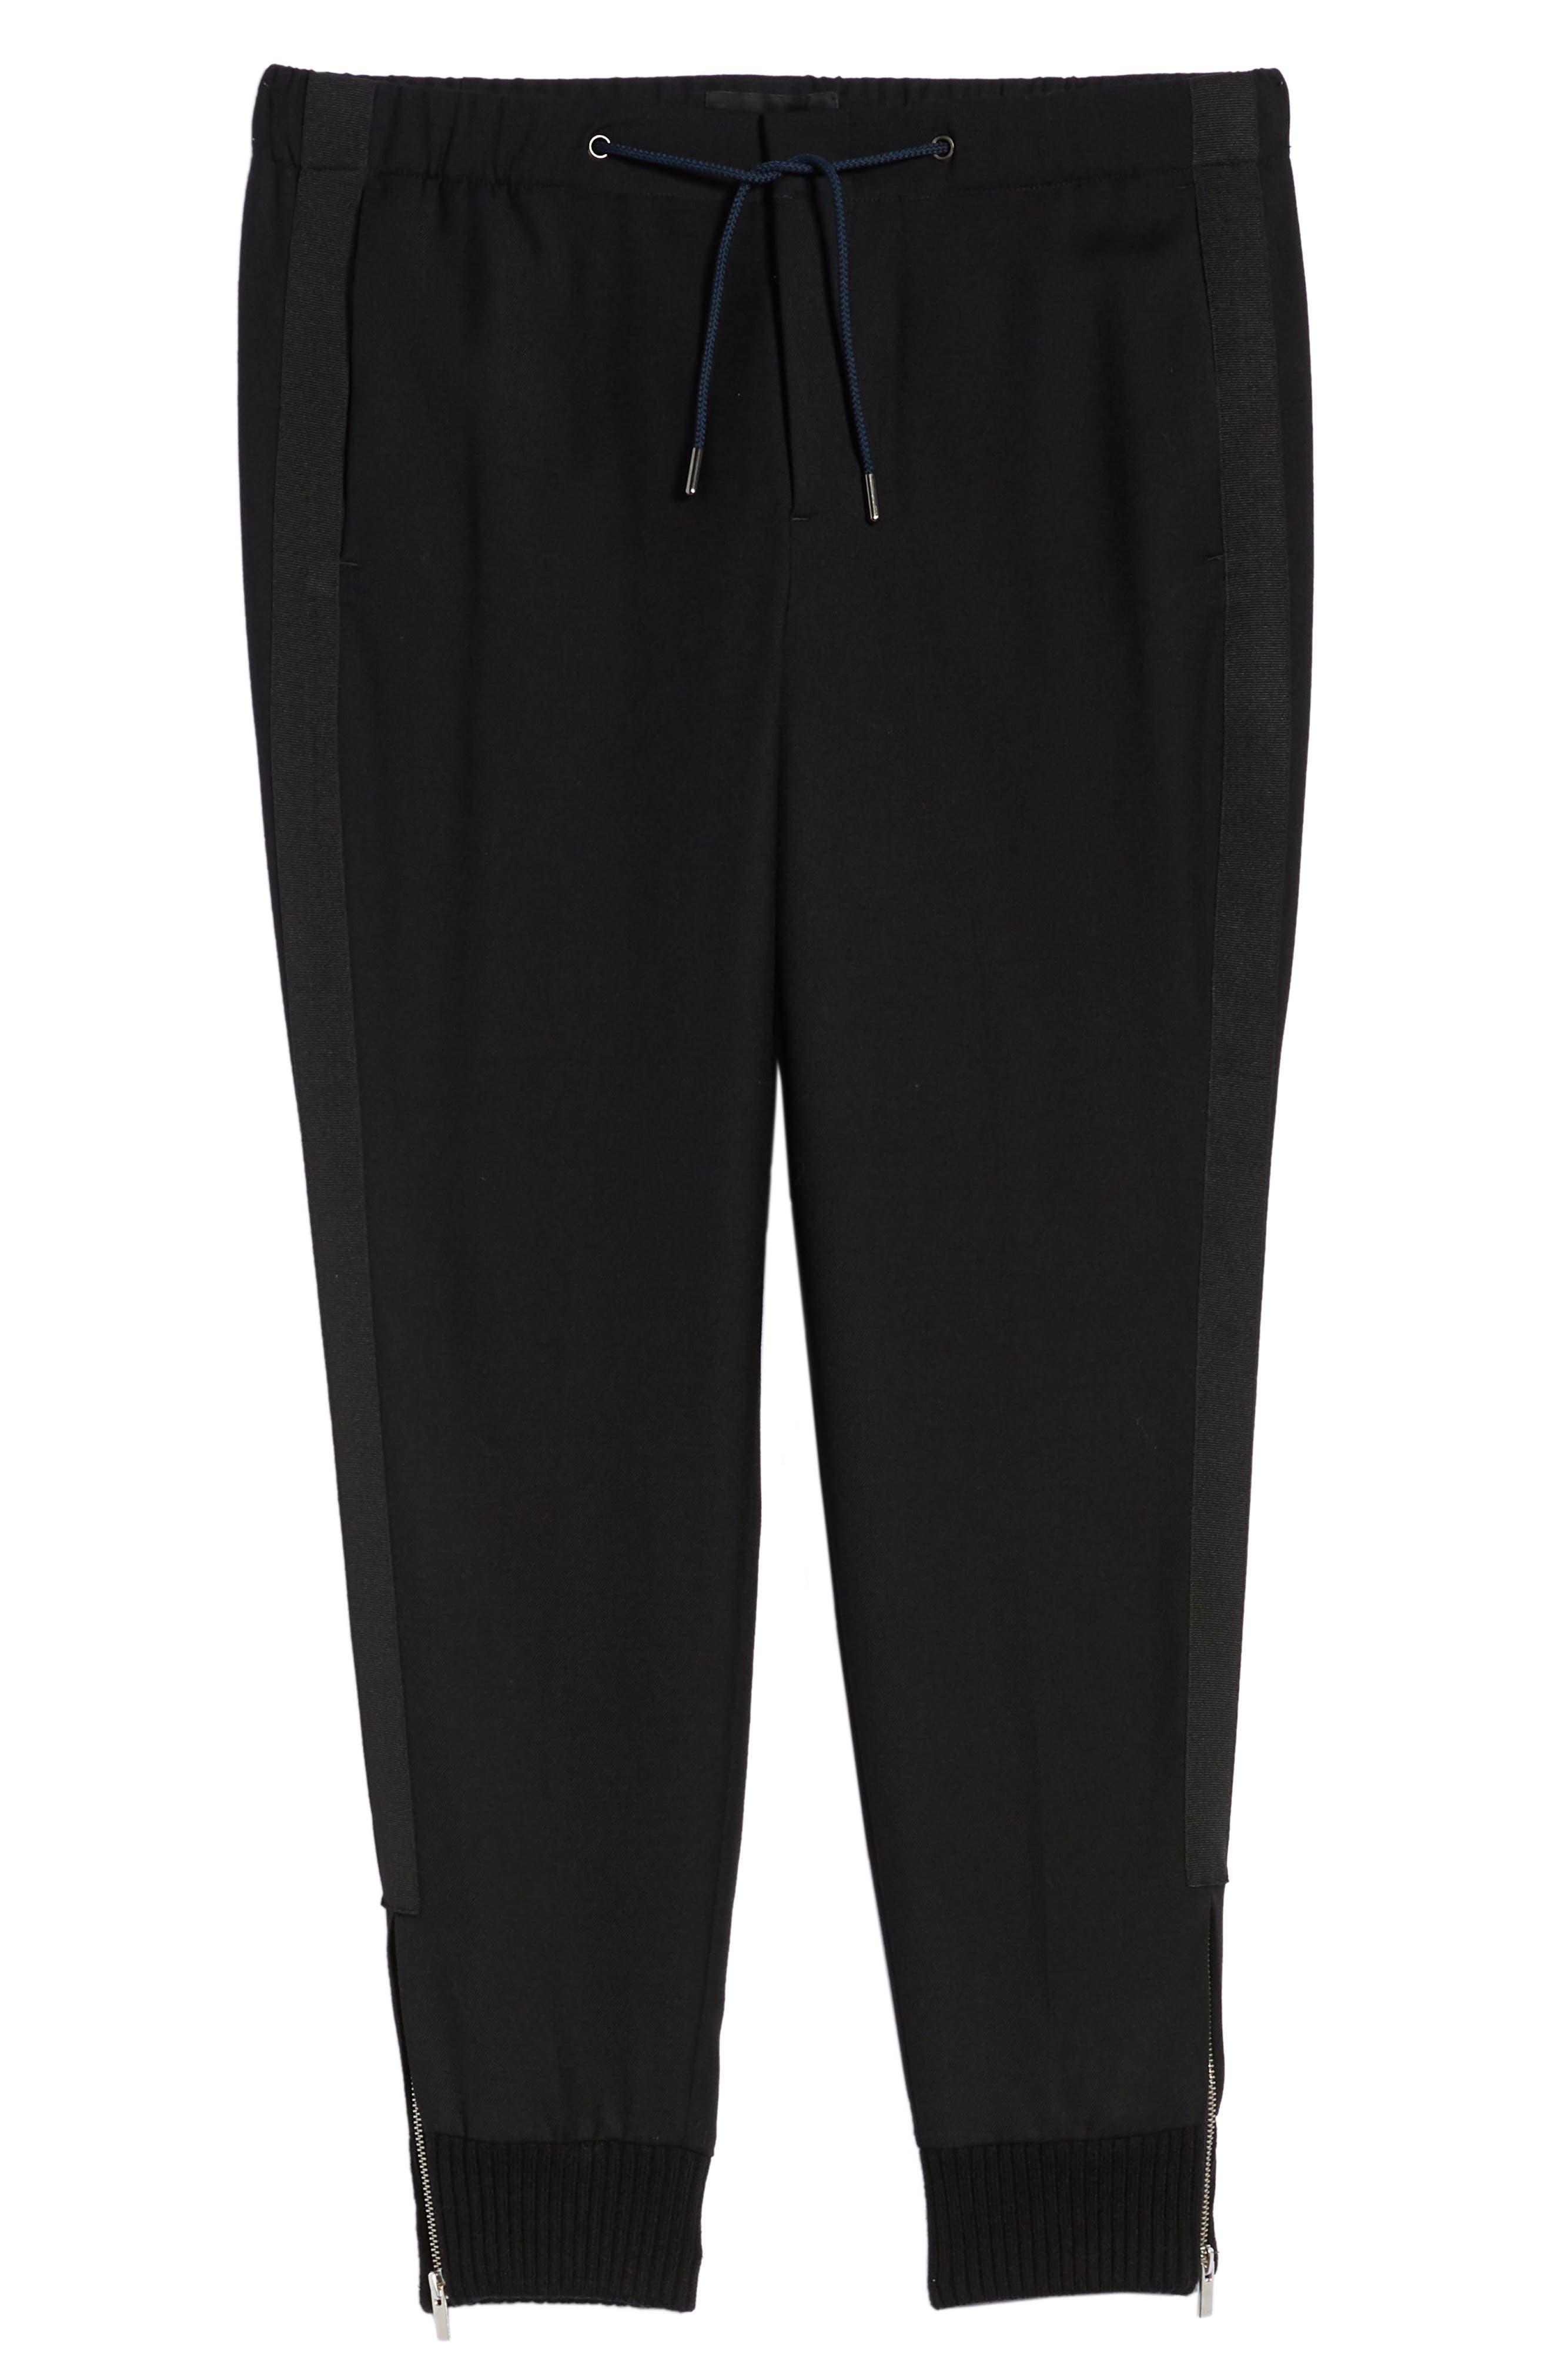 THE KOOPLES, Straight Leg Woven Jogger Pants, Alternate thumbnail 7, color, BLACK